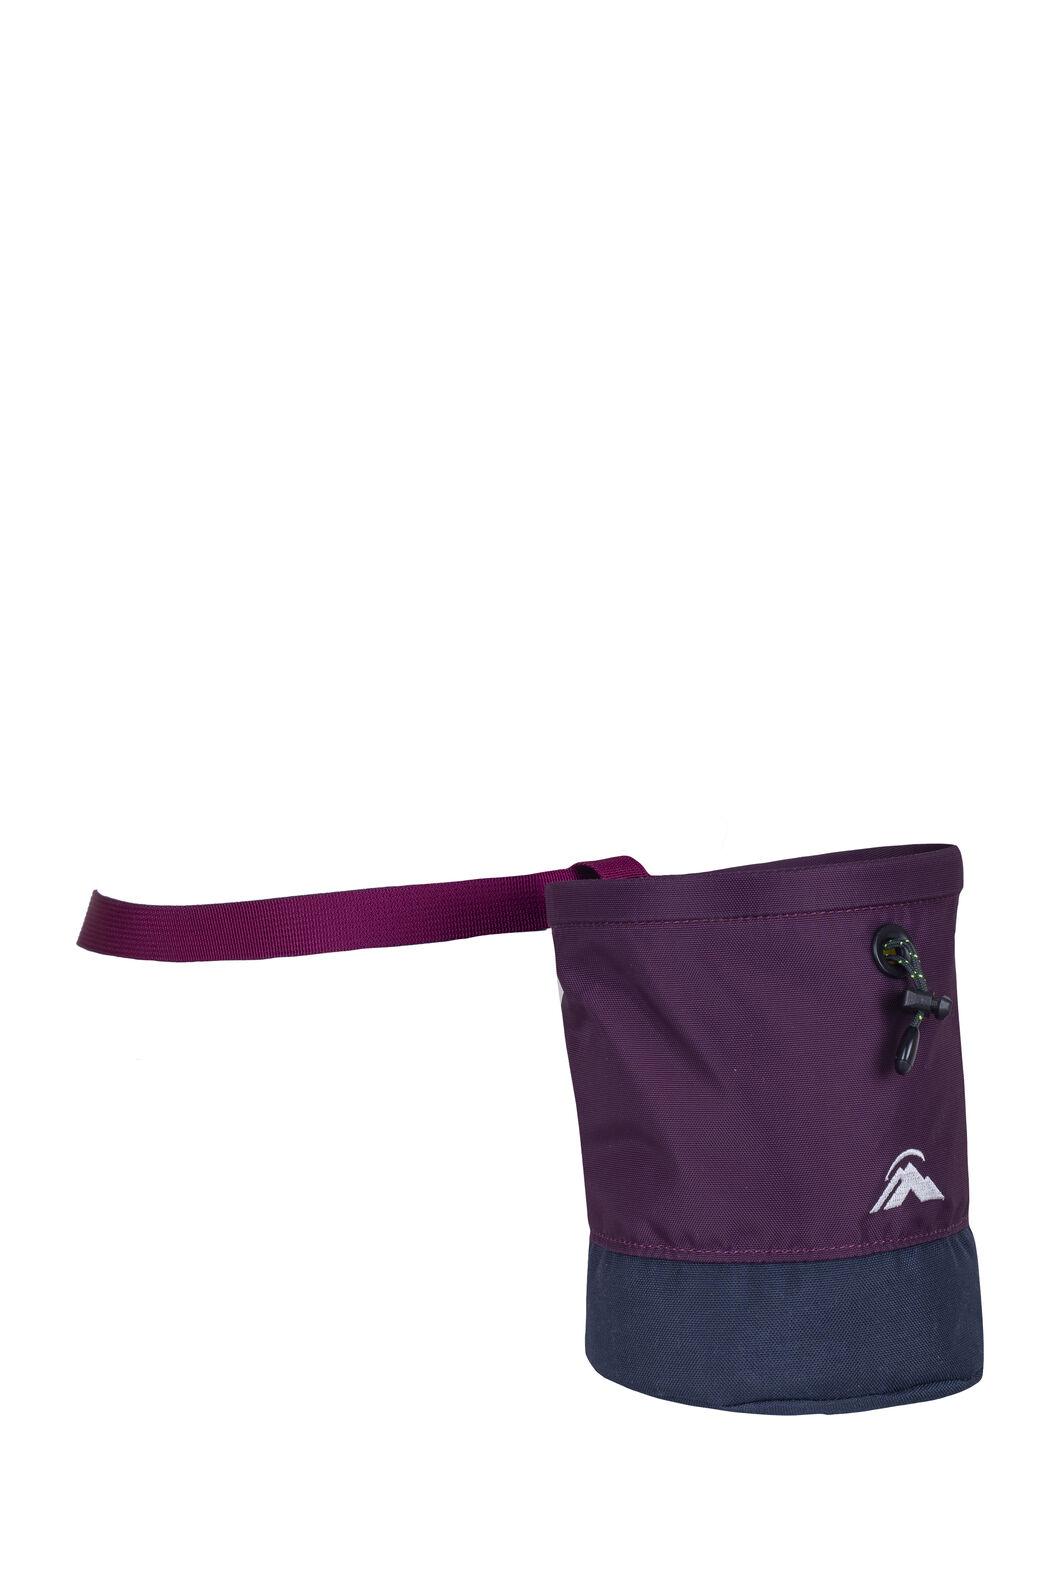 Macpac Chalk Bag, Assorted, hi-res